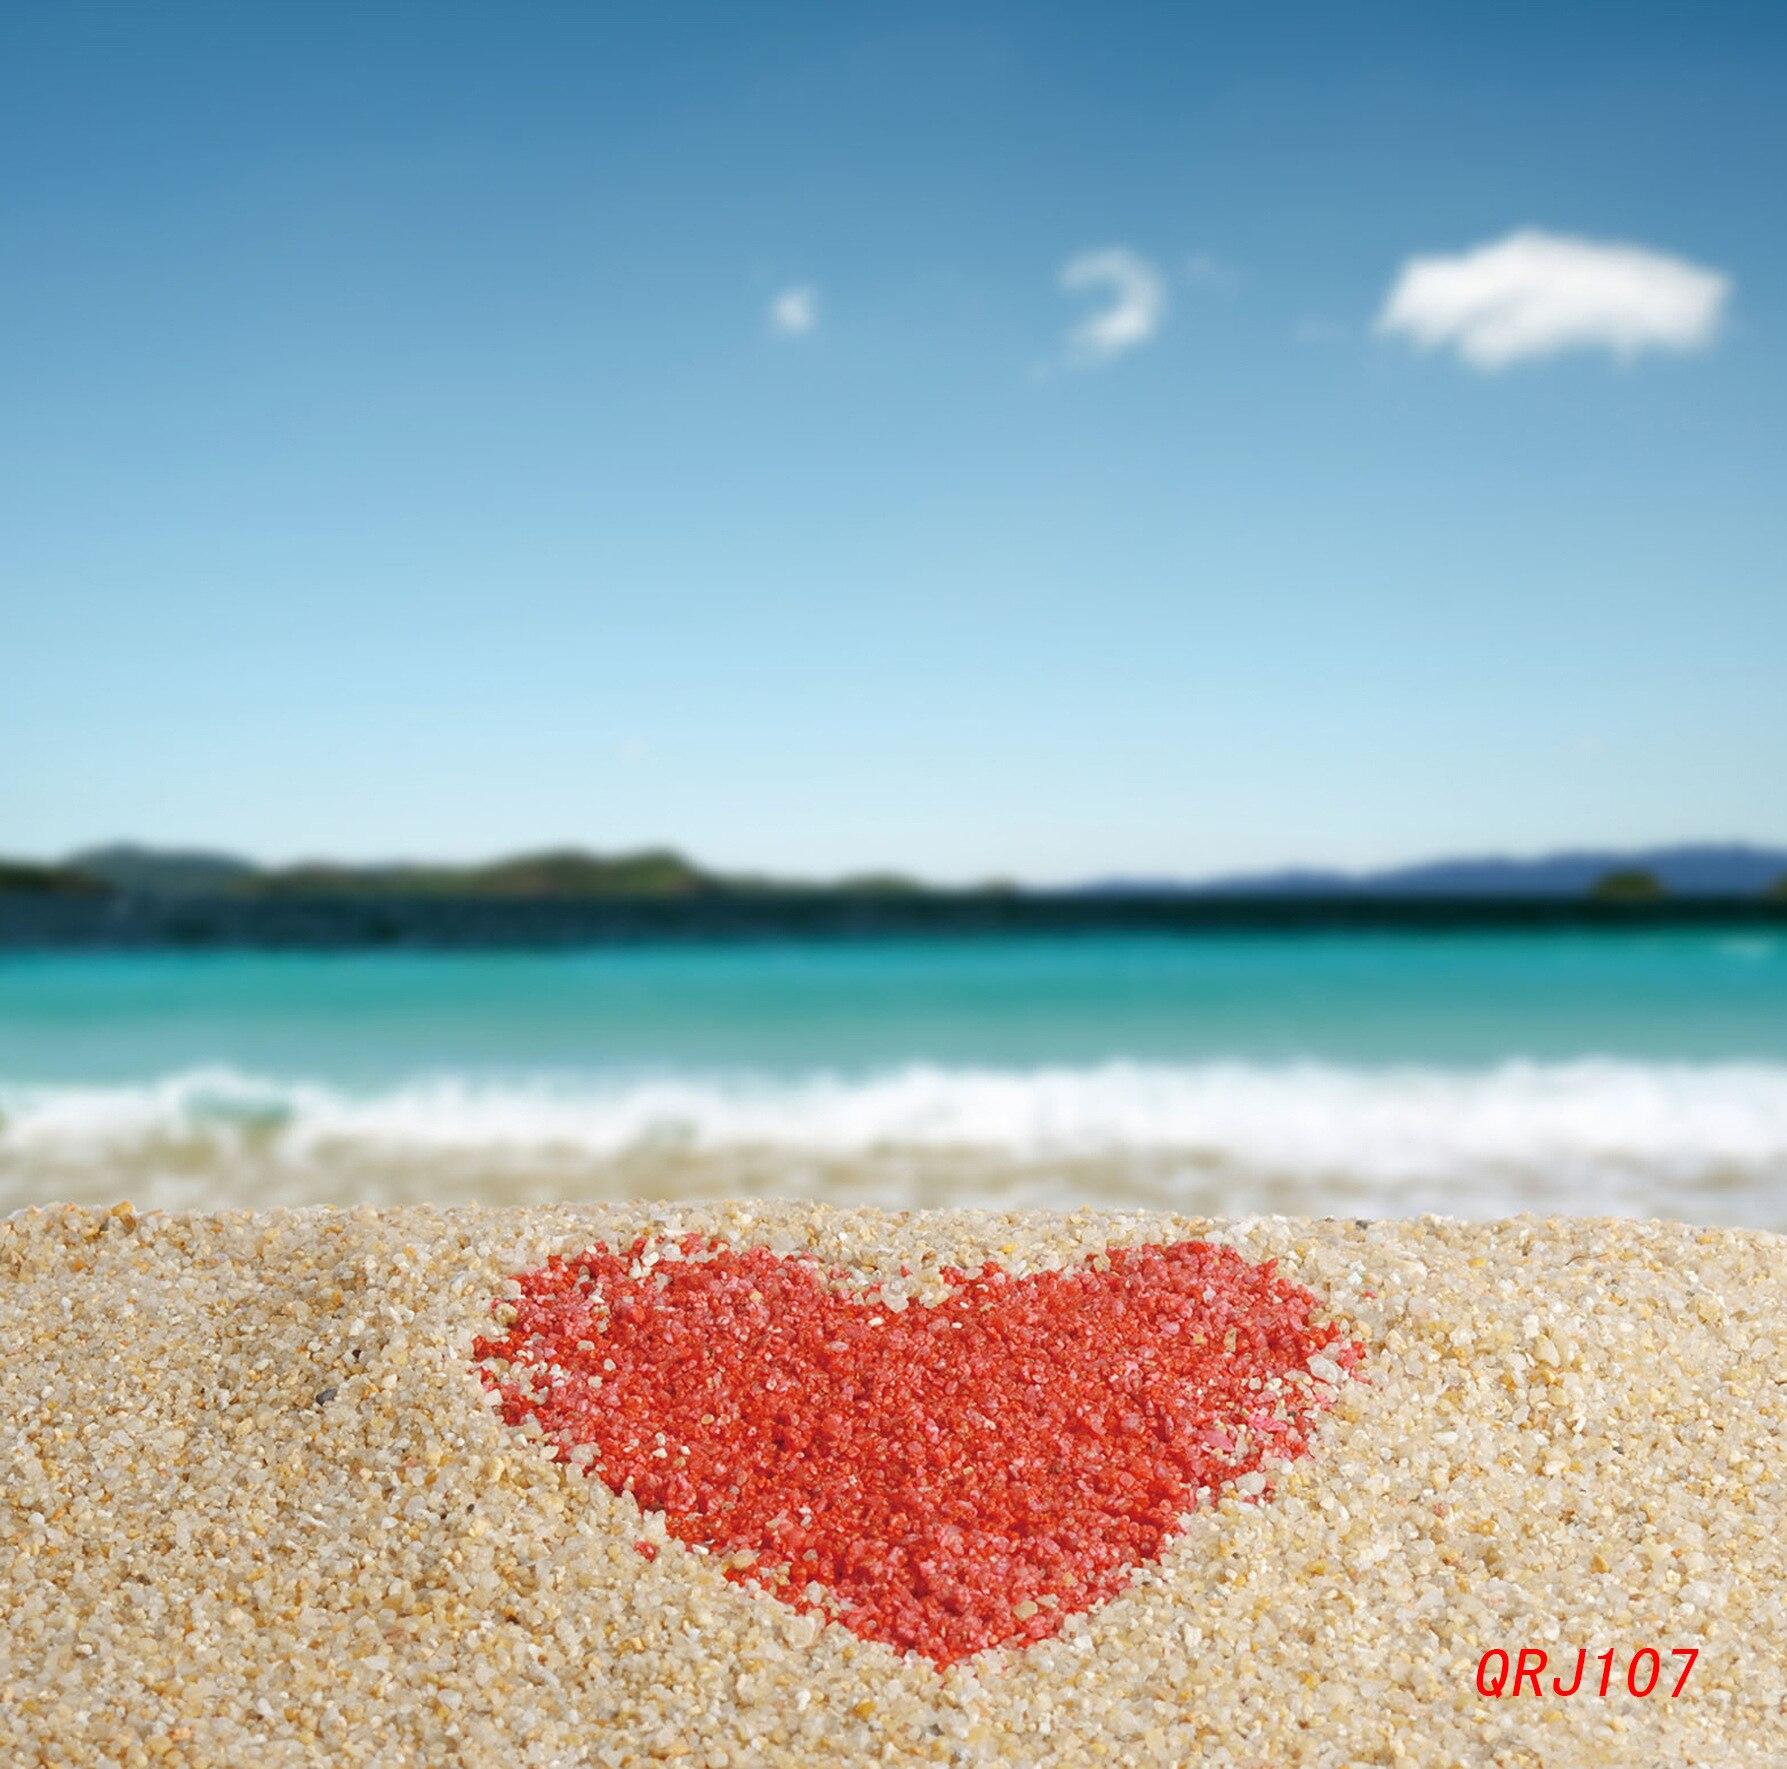 10X20FT Seascape Photography Backdrops Wedding Ballon Beach Photo Studio Background